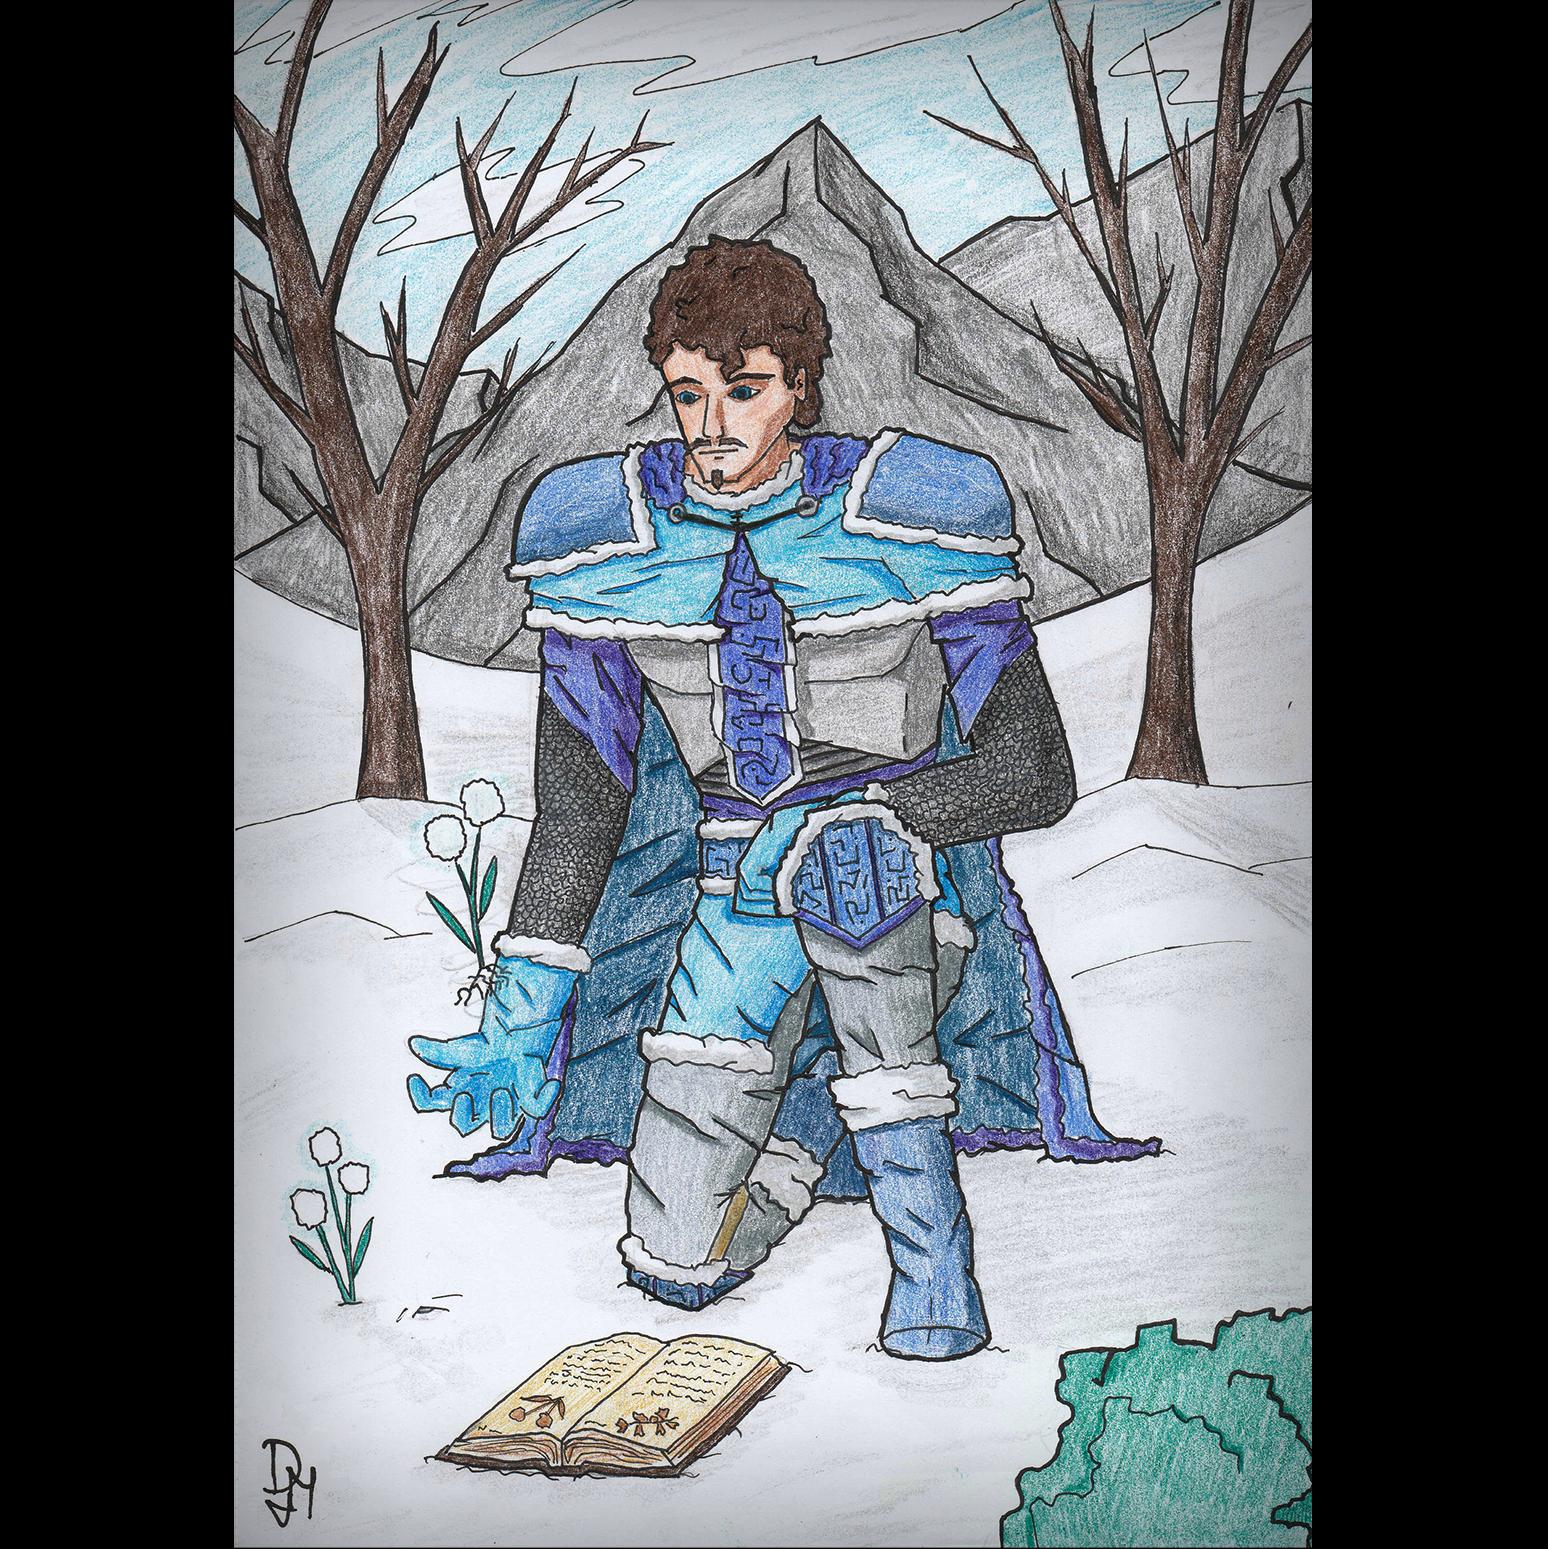 Frost Mage loving Herbalism